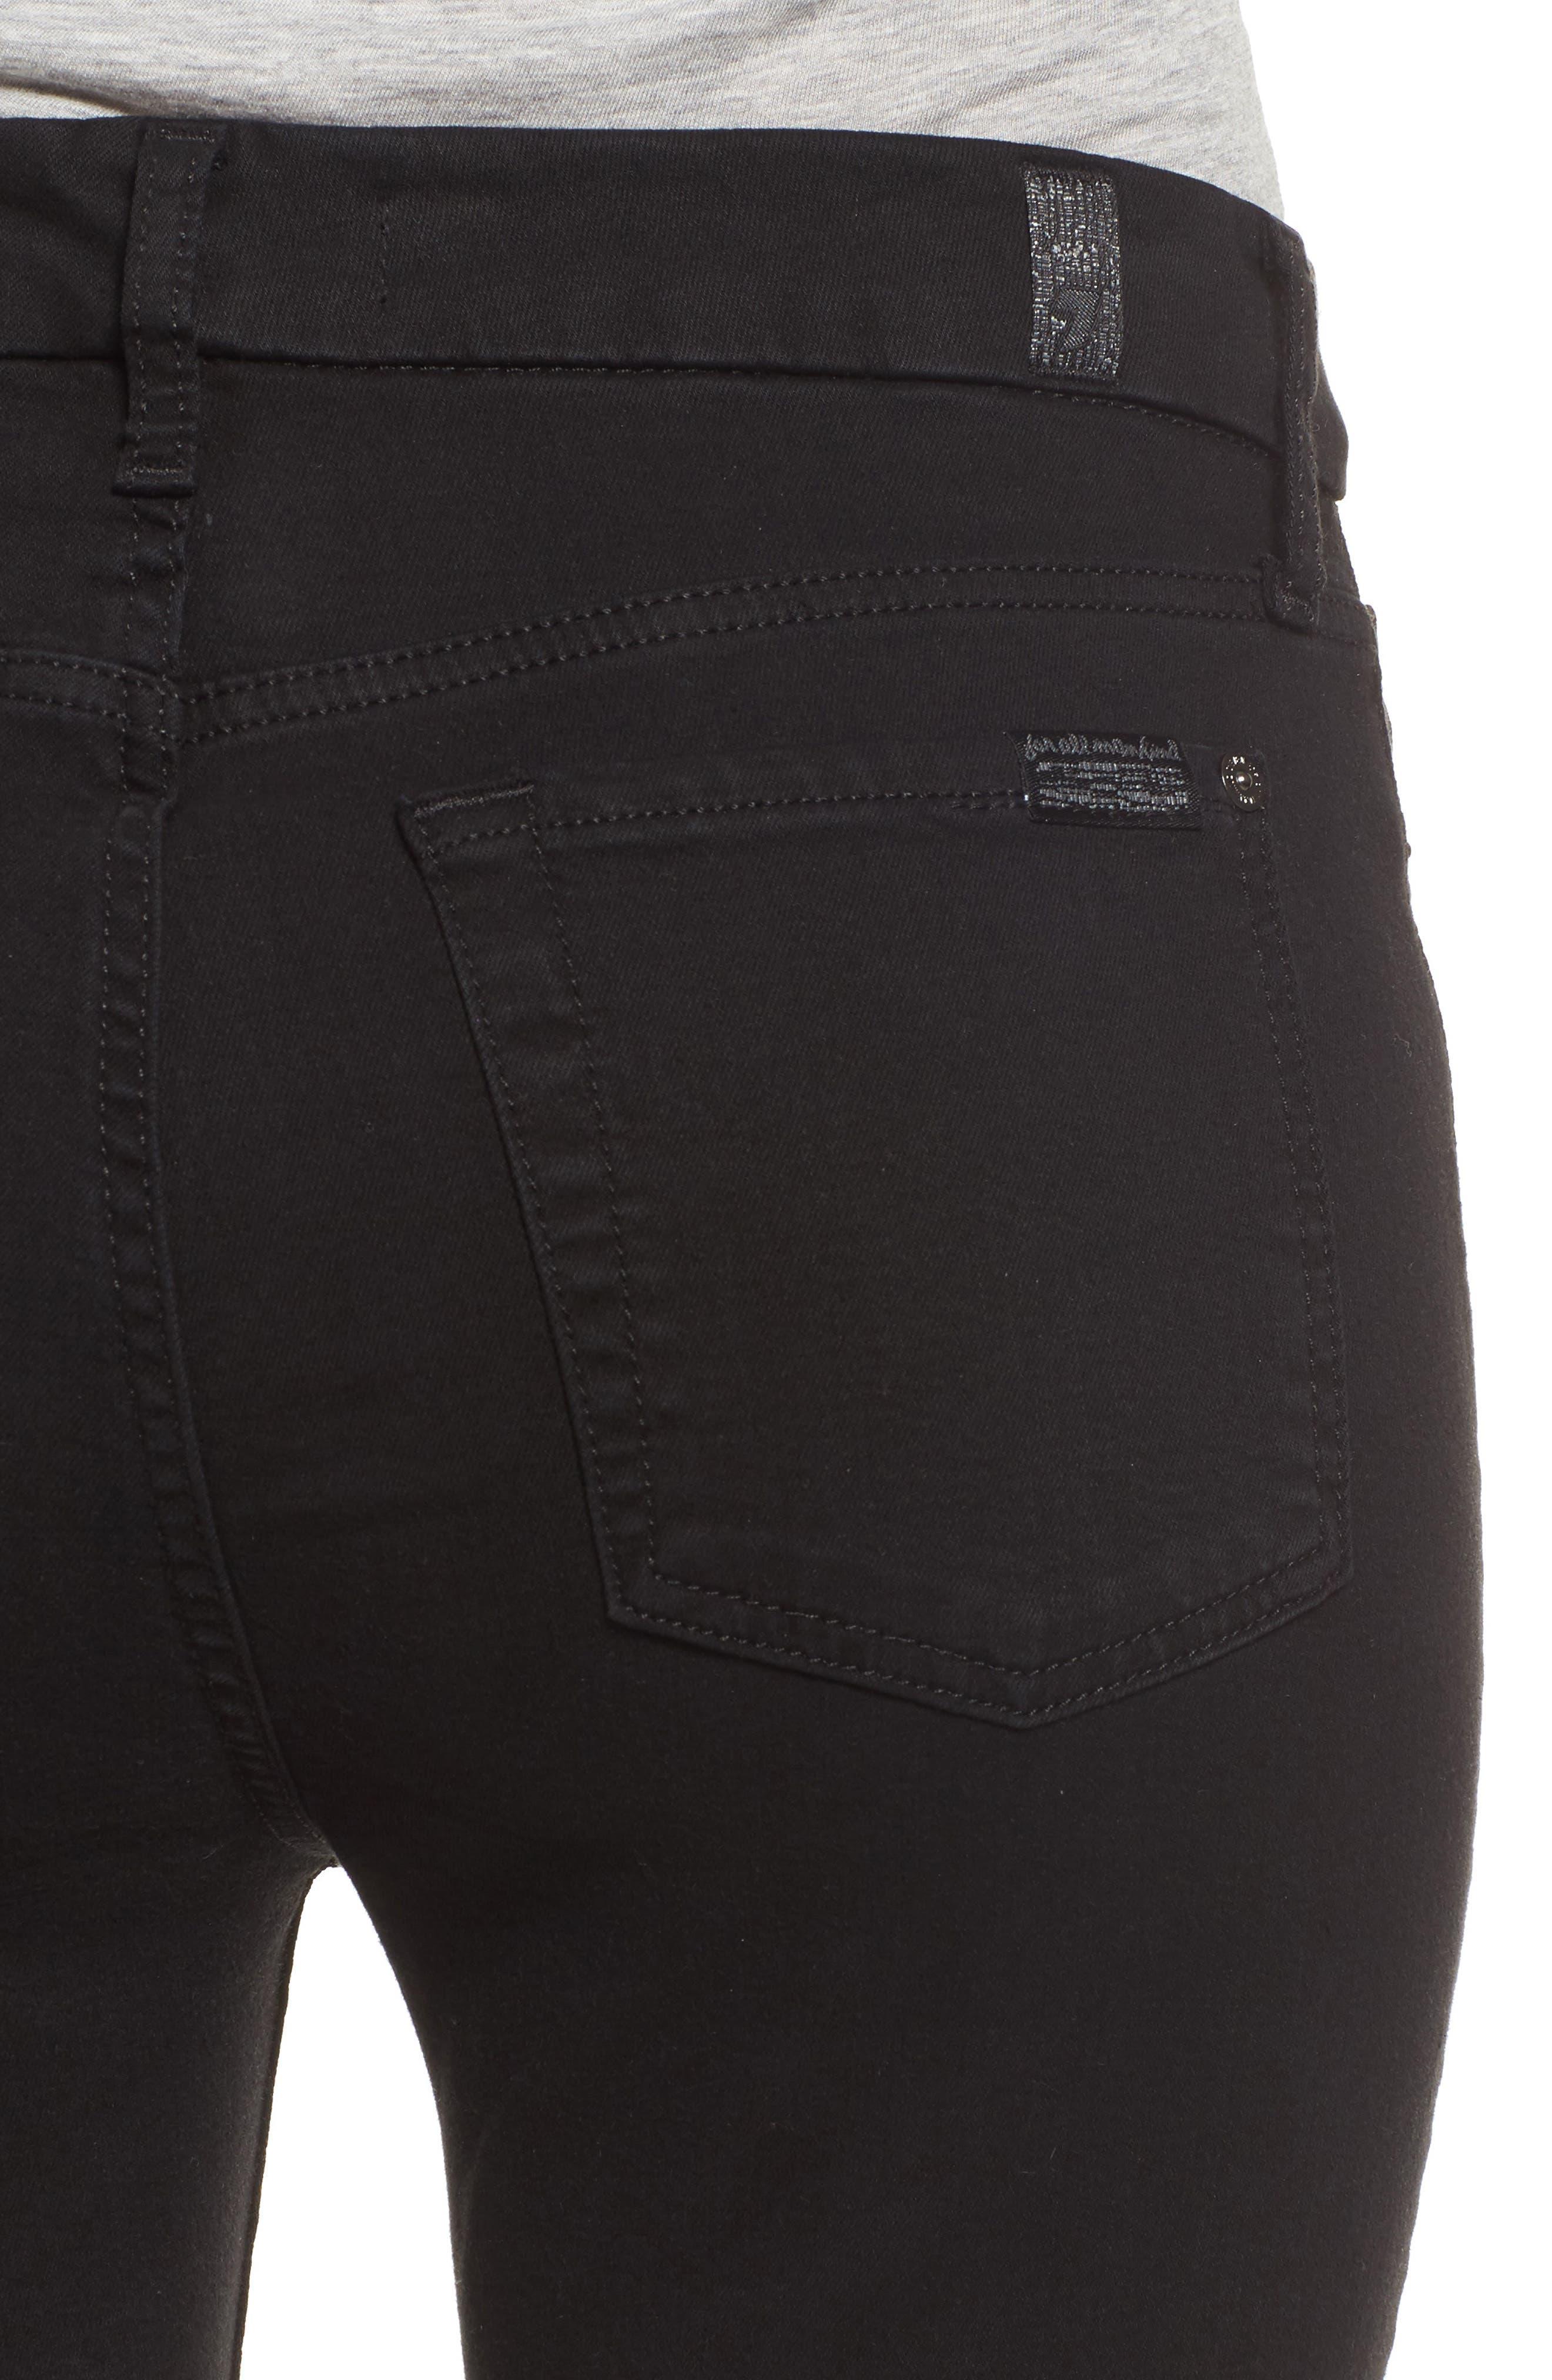 b(air) High Waist Skinny Jeans,                             Alternate thumbnail 4, color,                             B(AIR) BLACK